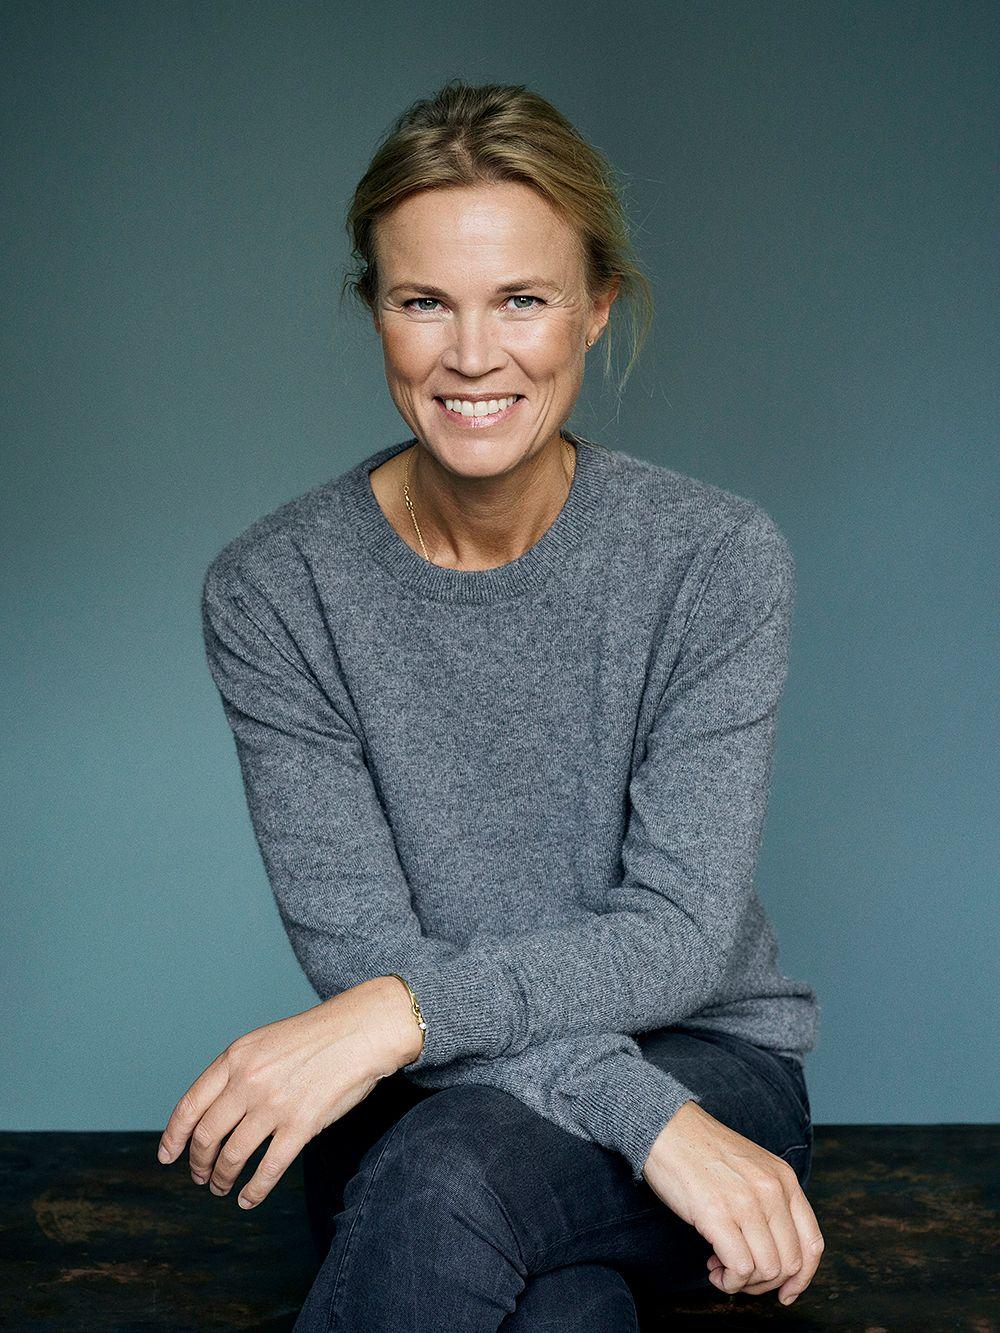 Danish designer Maria Høgh Heilmann